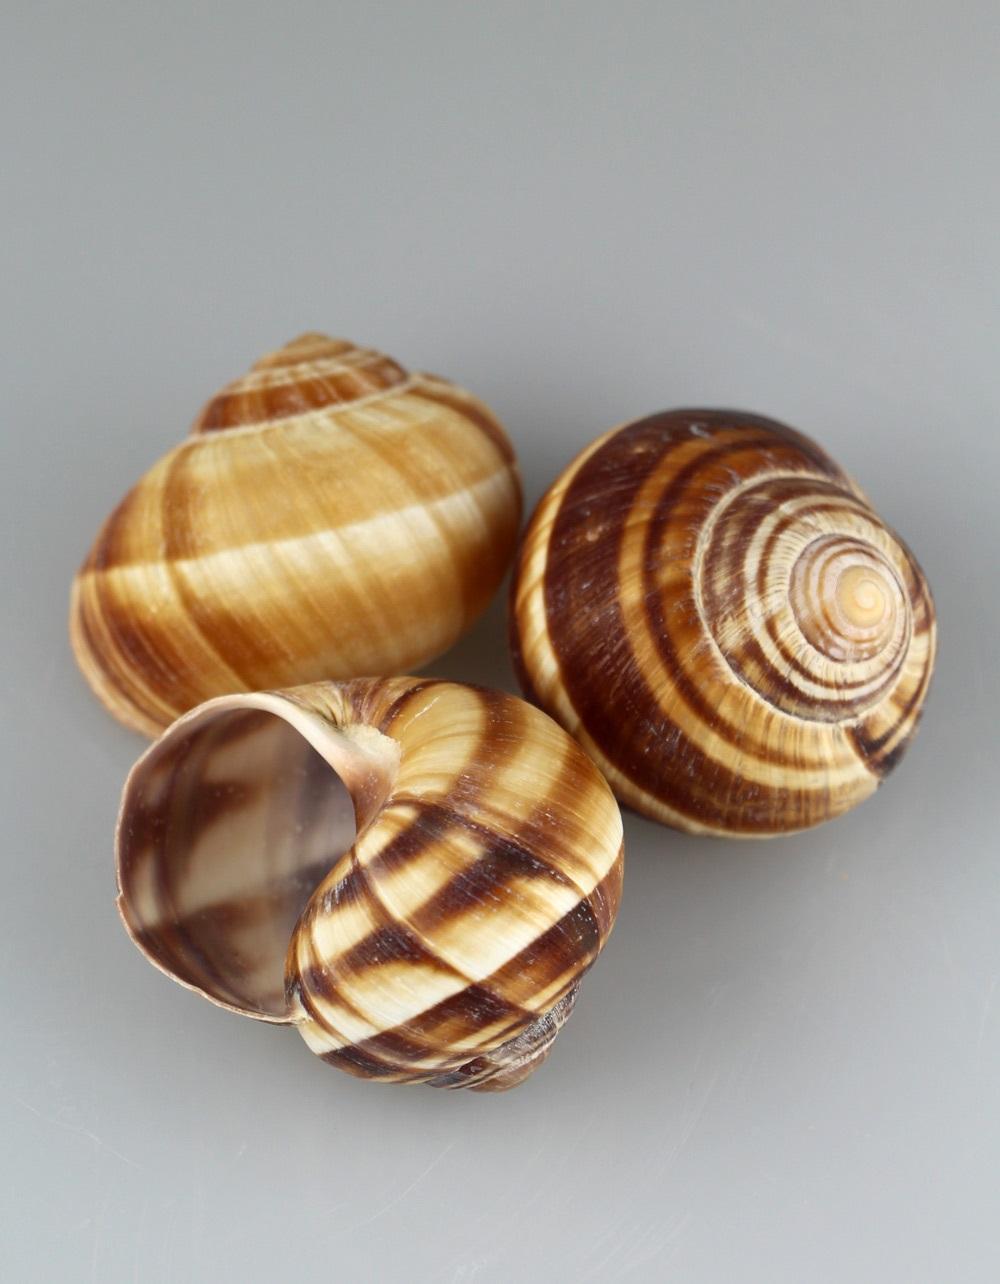 Snail Shells in Bulk Box 72 pieces